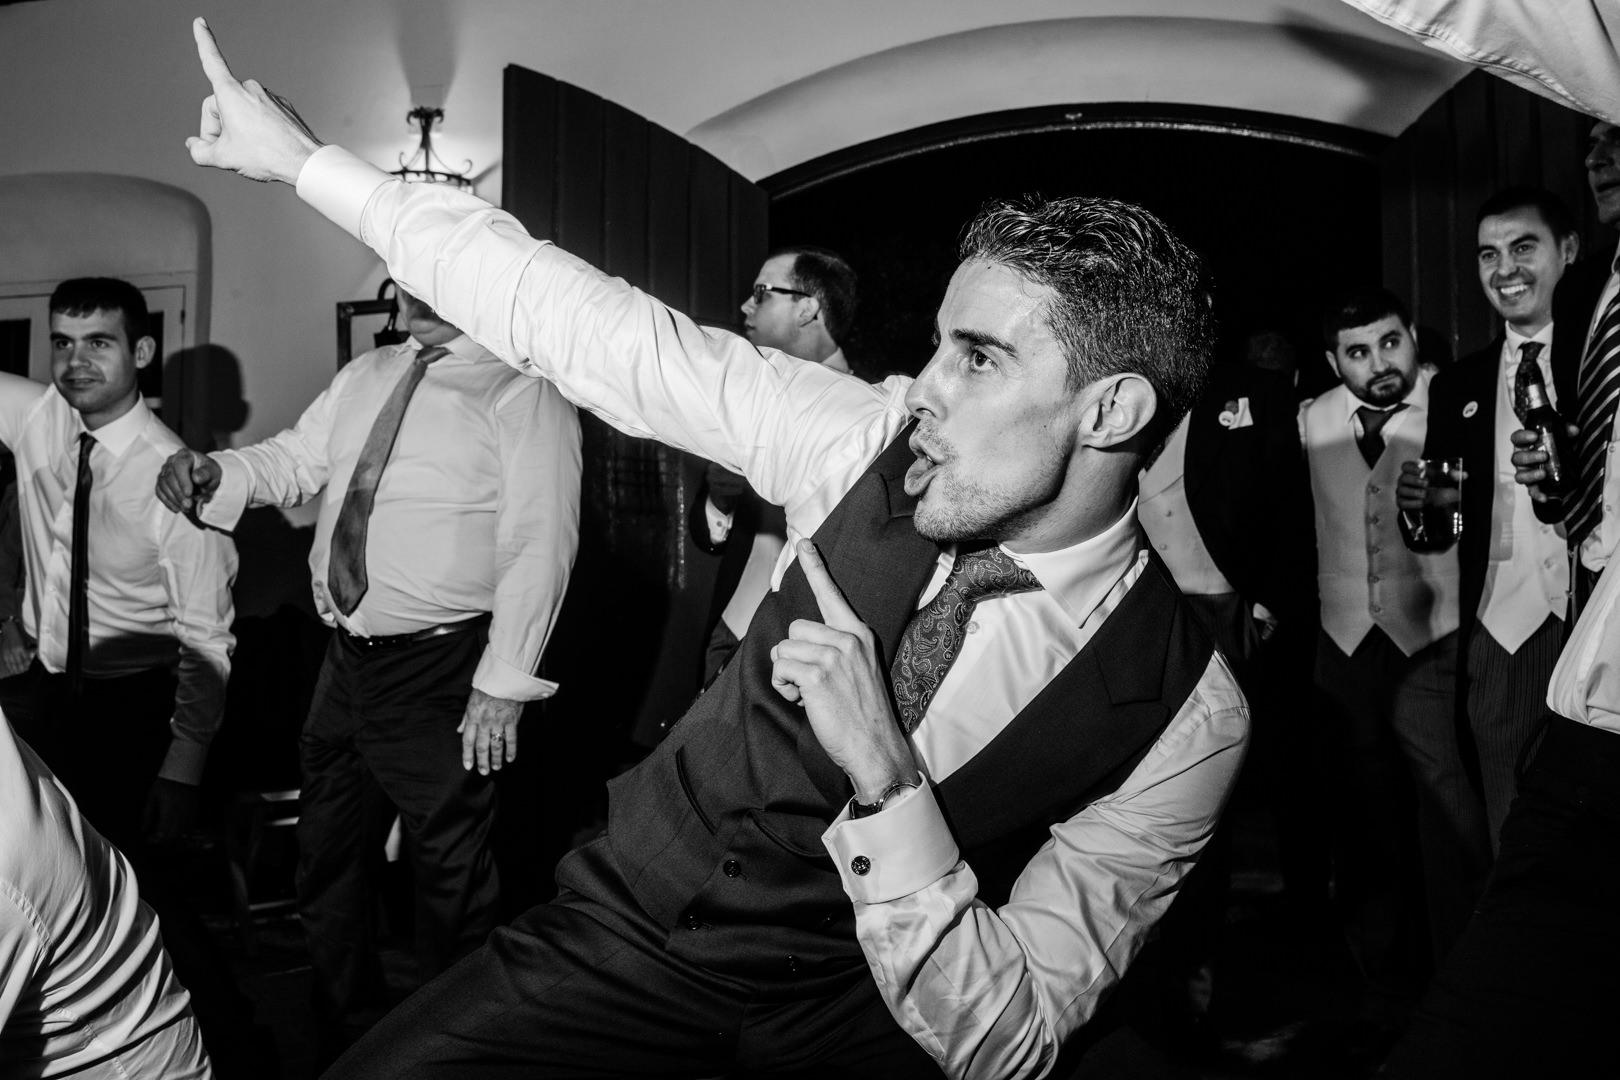 Boda-sevilla-Wedding-engagement-Rafael-Torres-fotografo-bodas-sevilla-madrid-barcelona-wedding-photographer--84.jpg